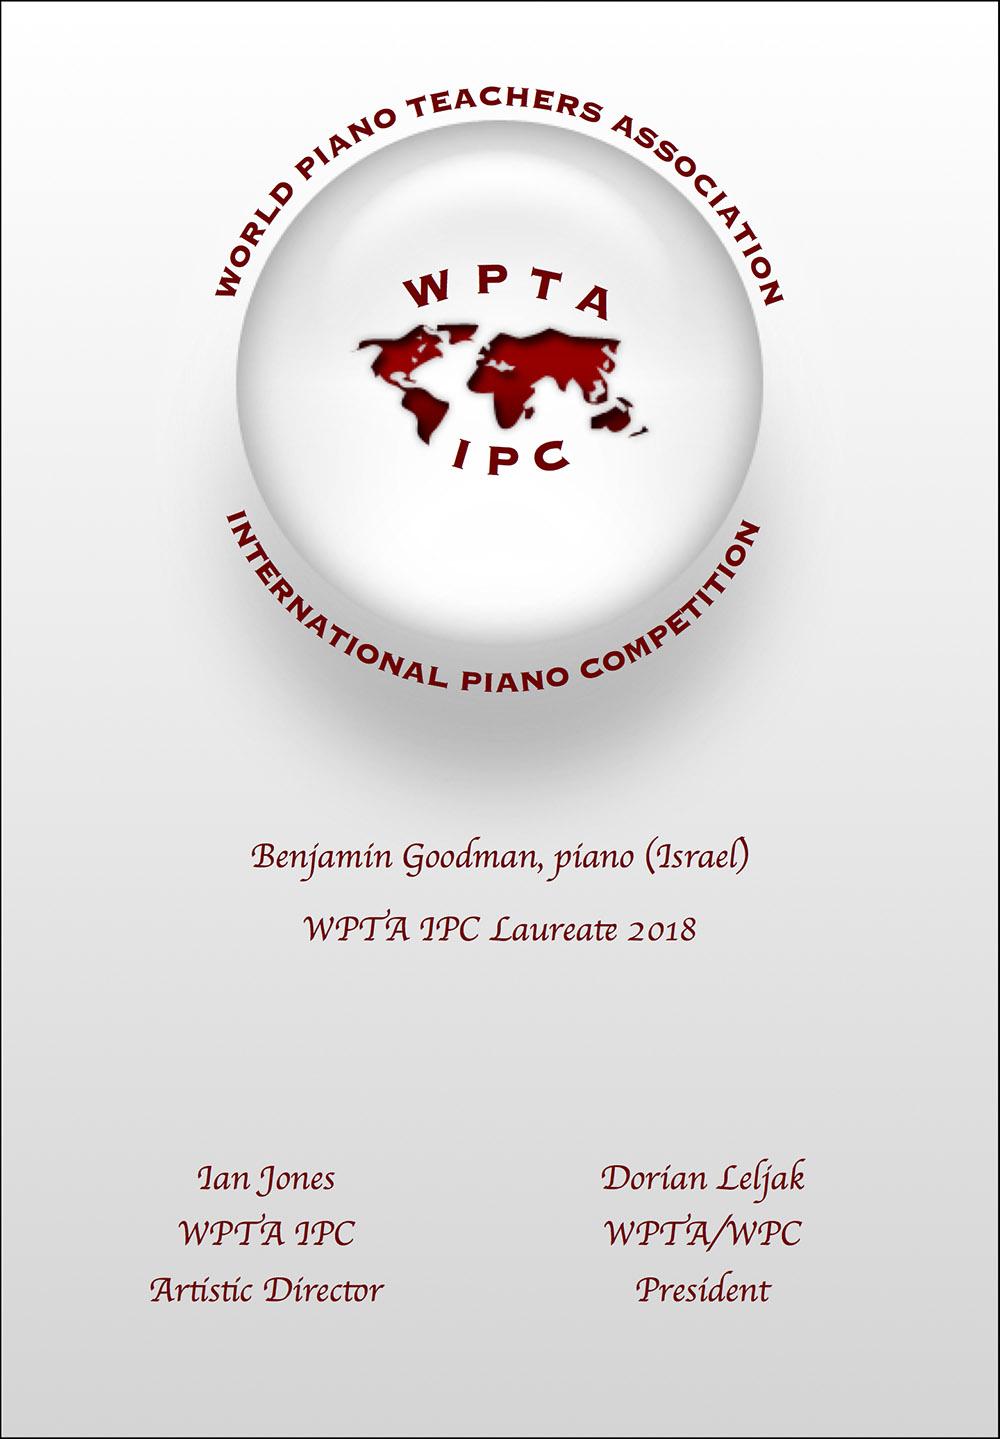 WPTA IPC - BENJAMIN GOODMAN